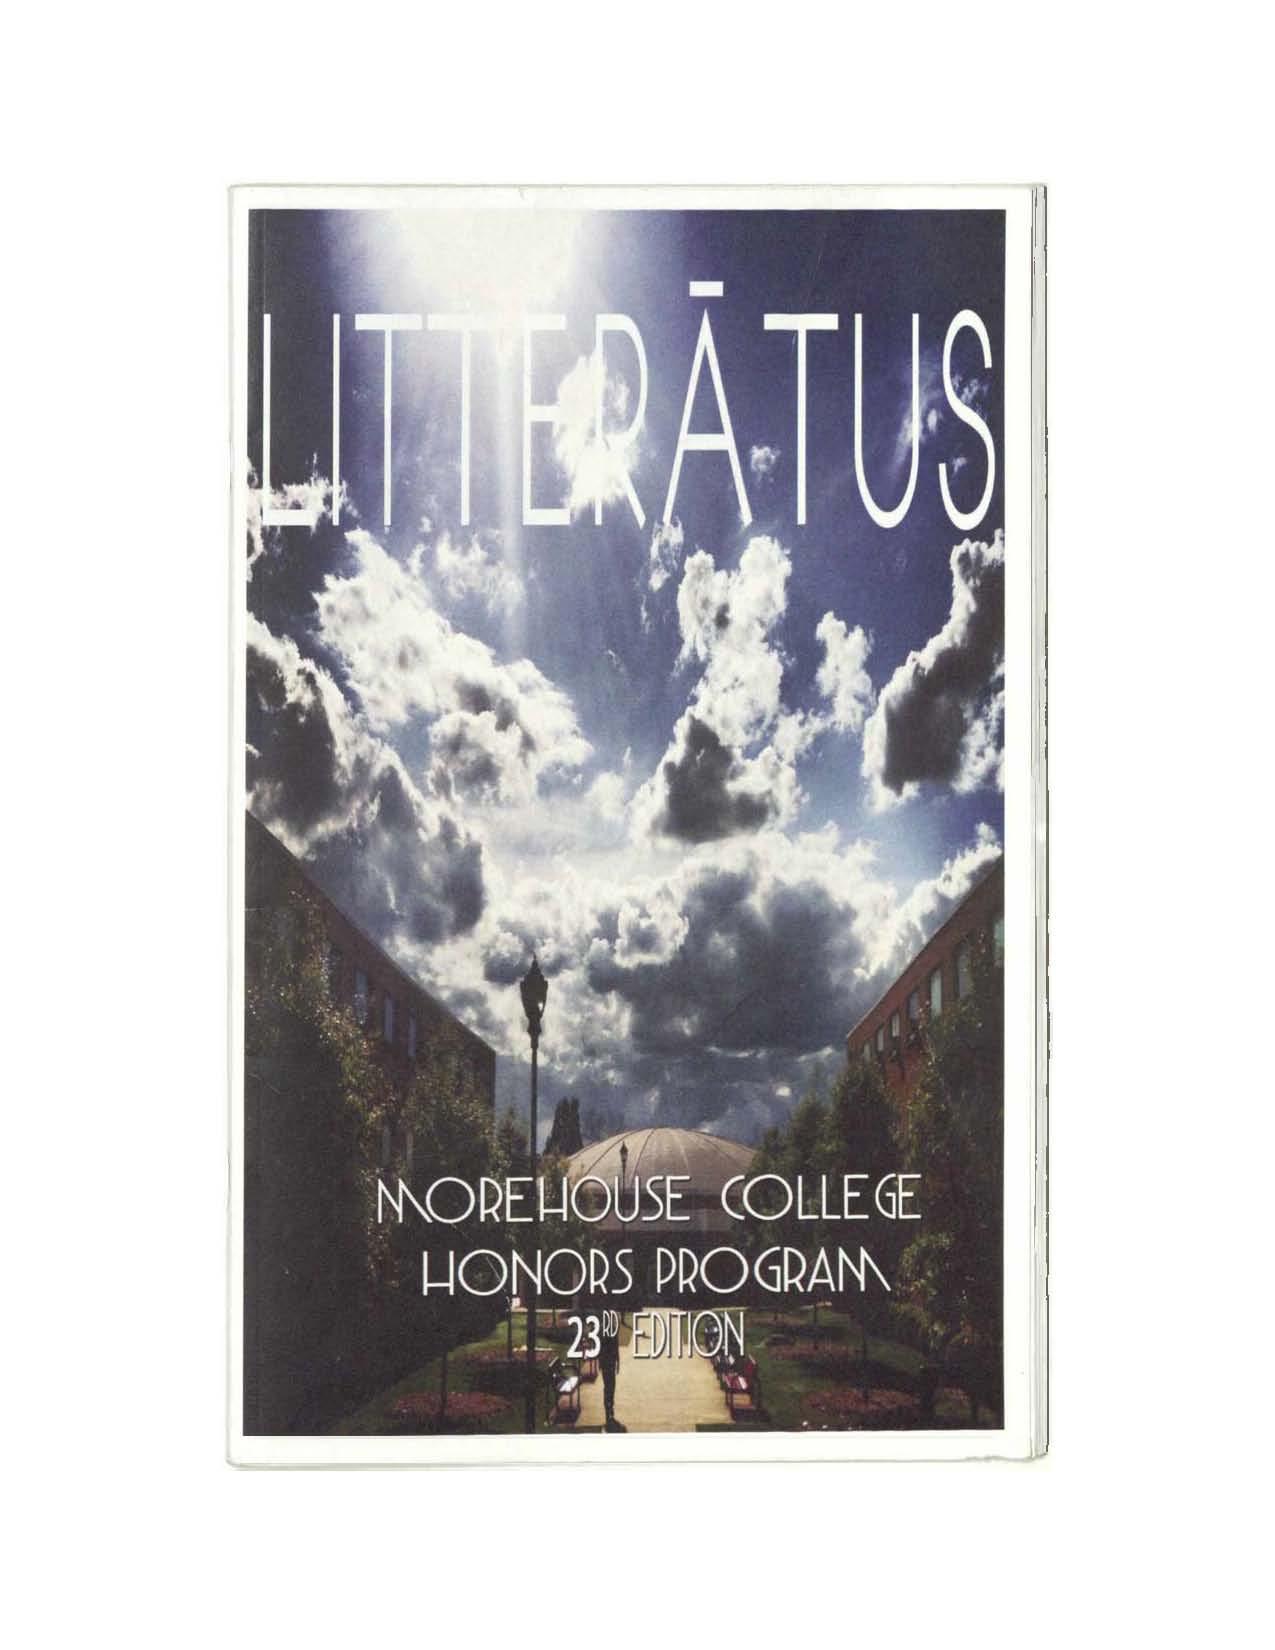 Litteratus 2013 Cover Image